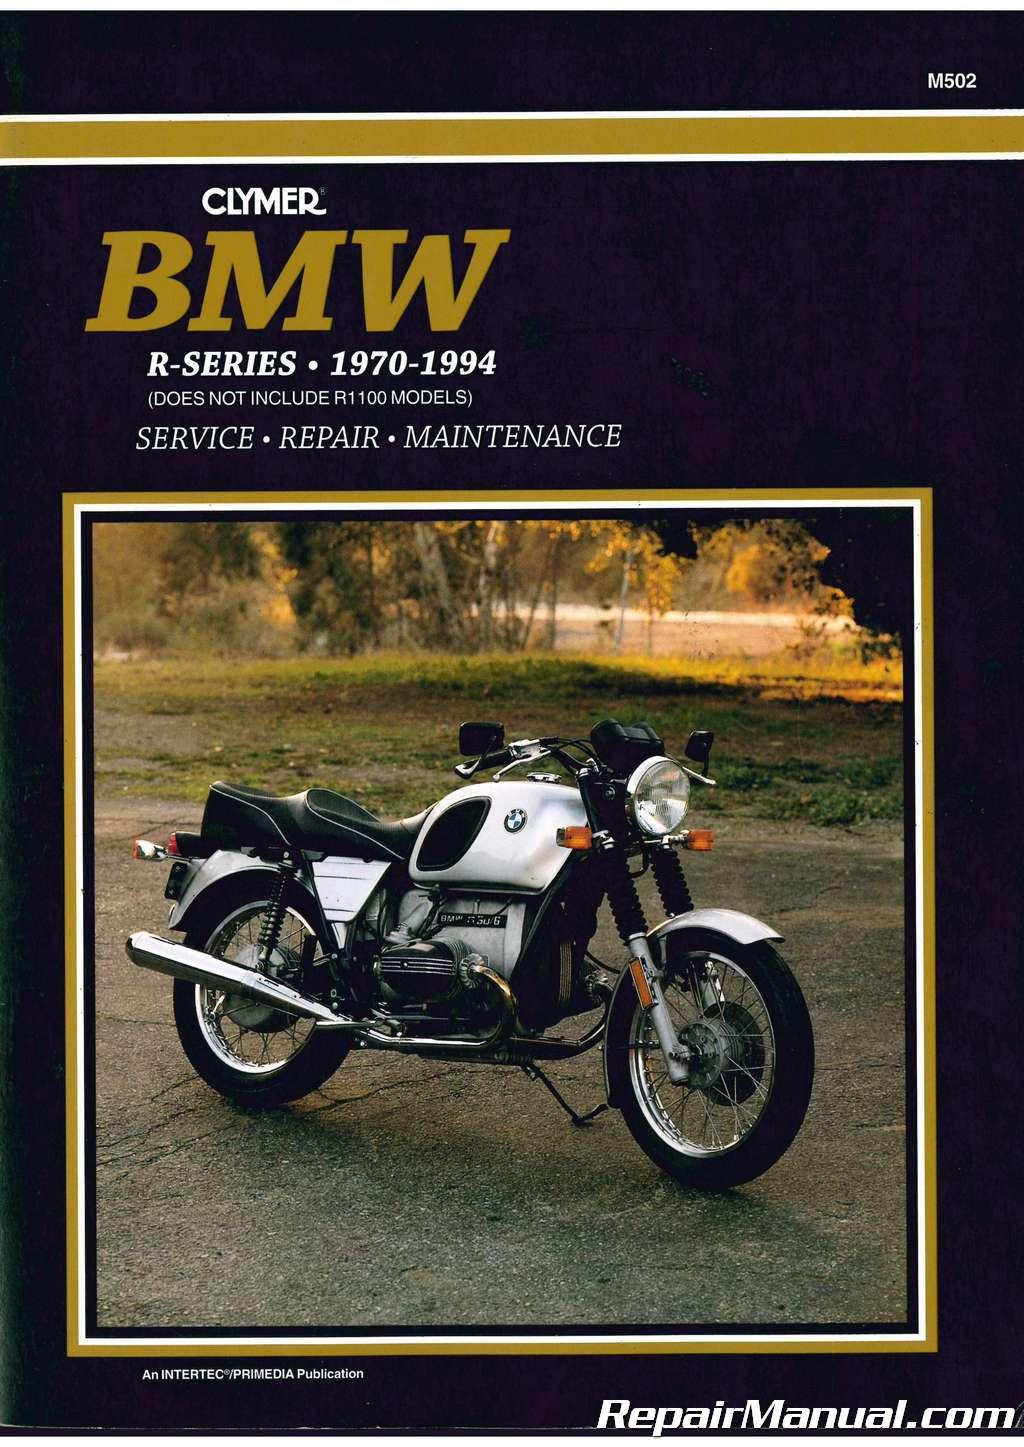 bmw r65 workshop manual free download